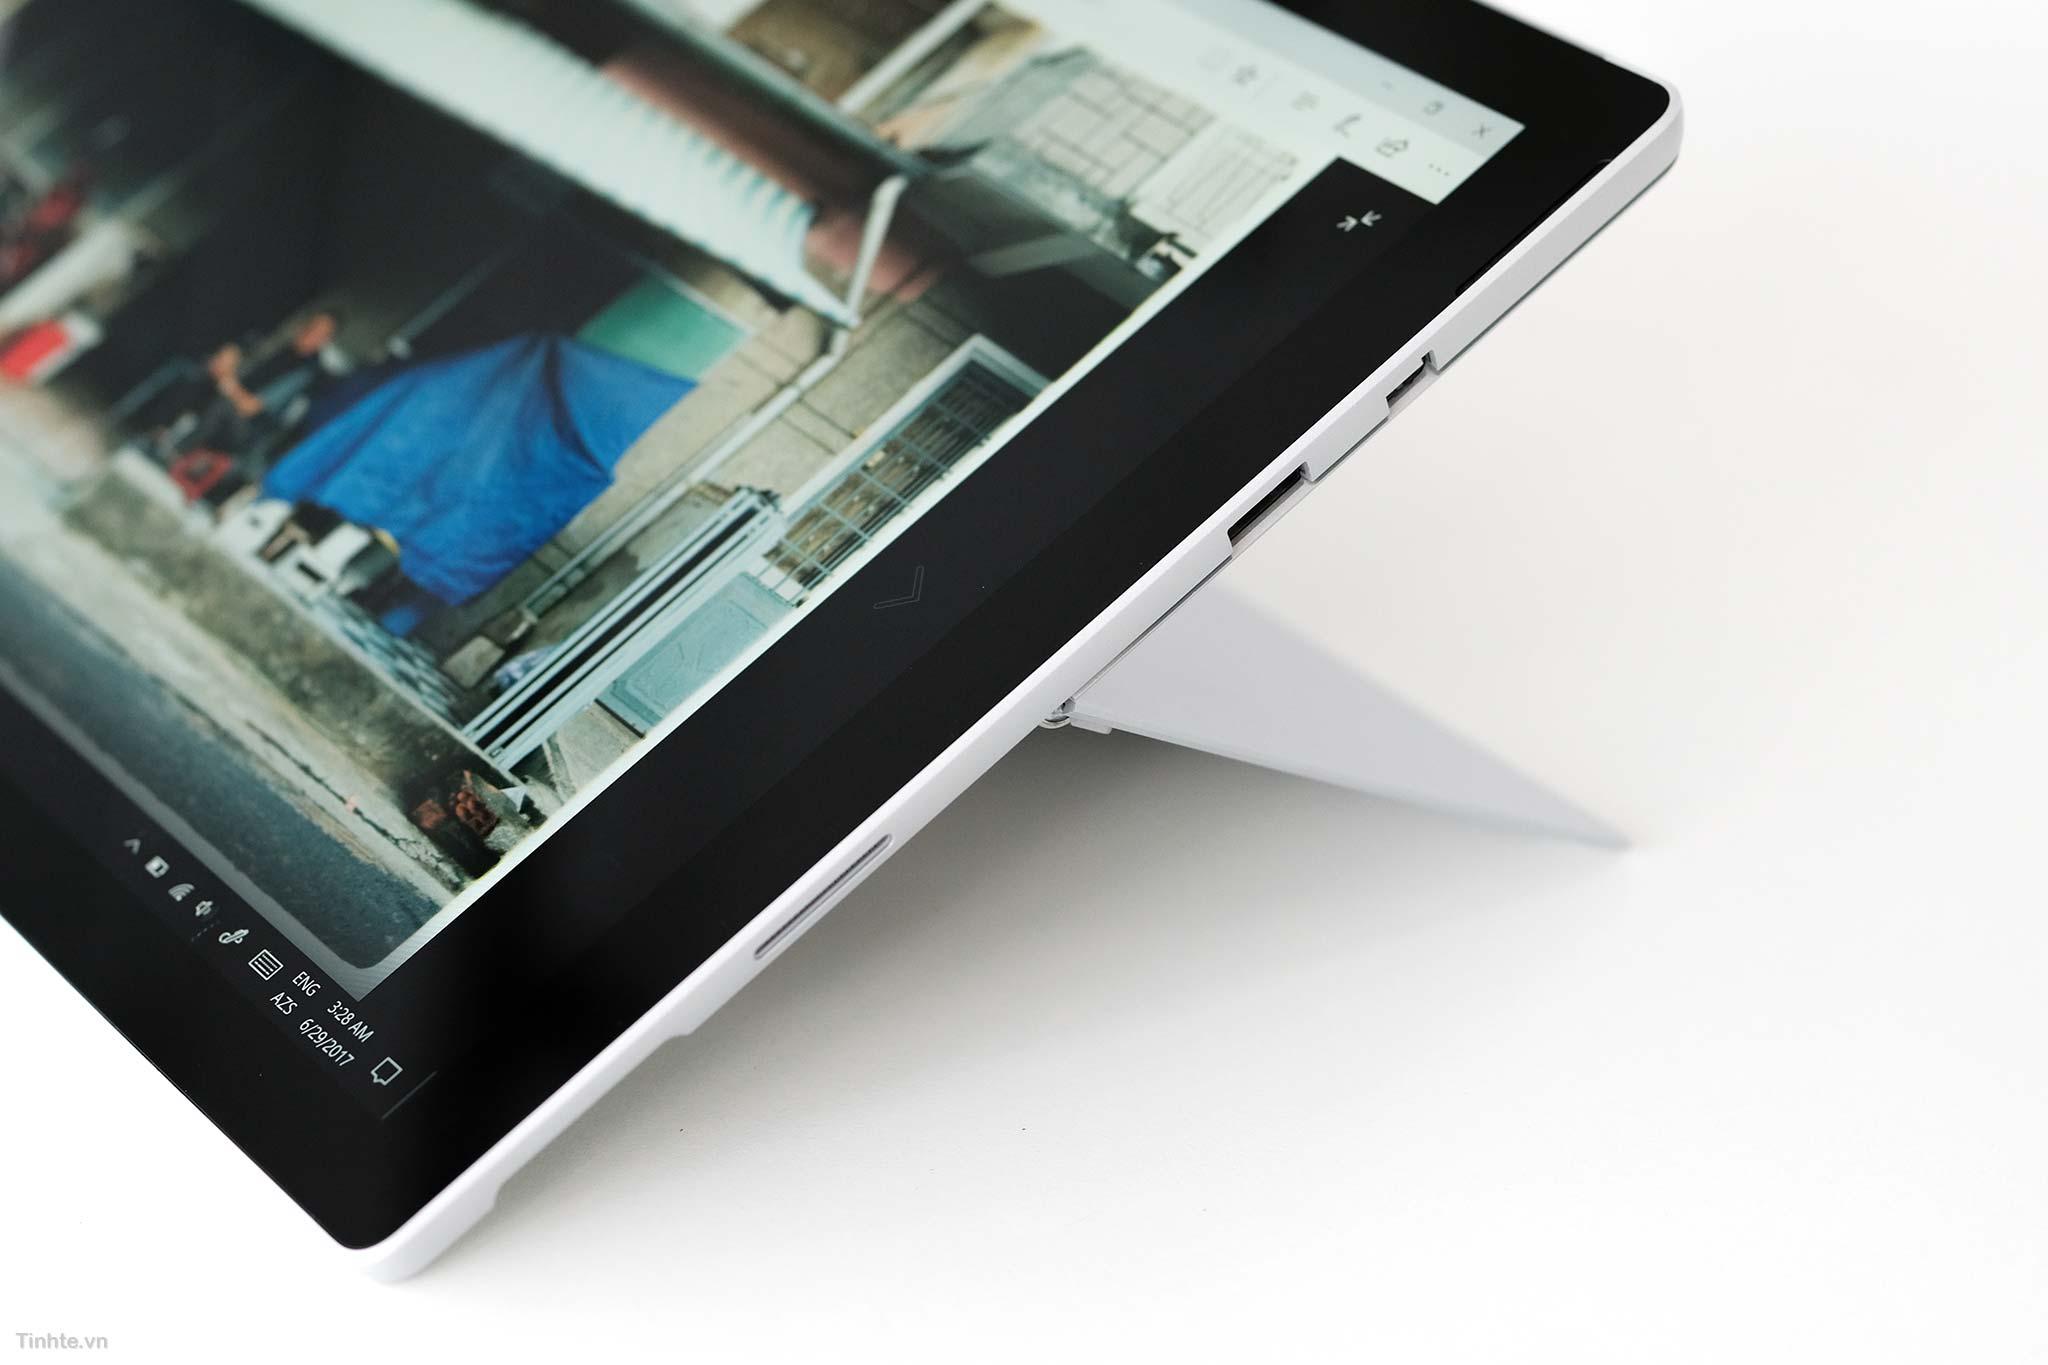 Surface_Pro_Surface_Laptop_3.jpg